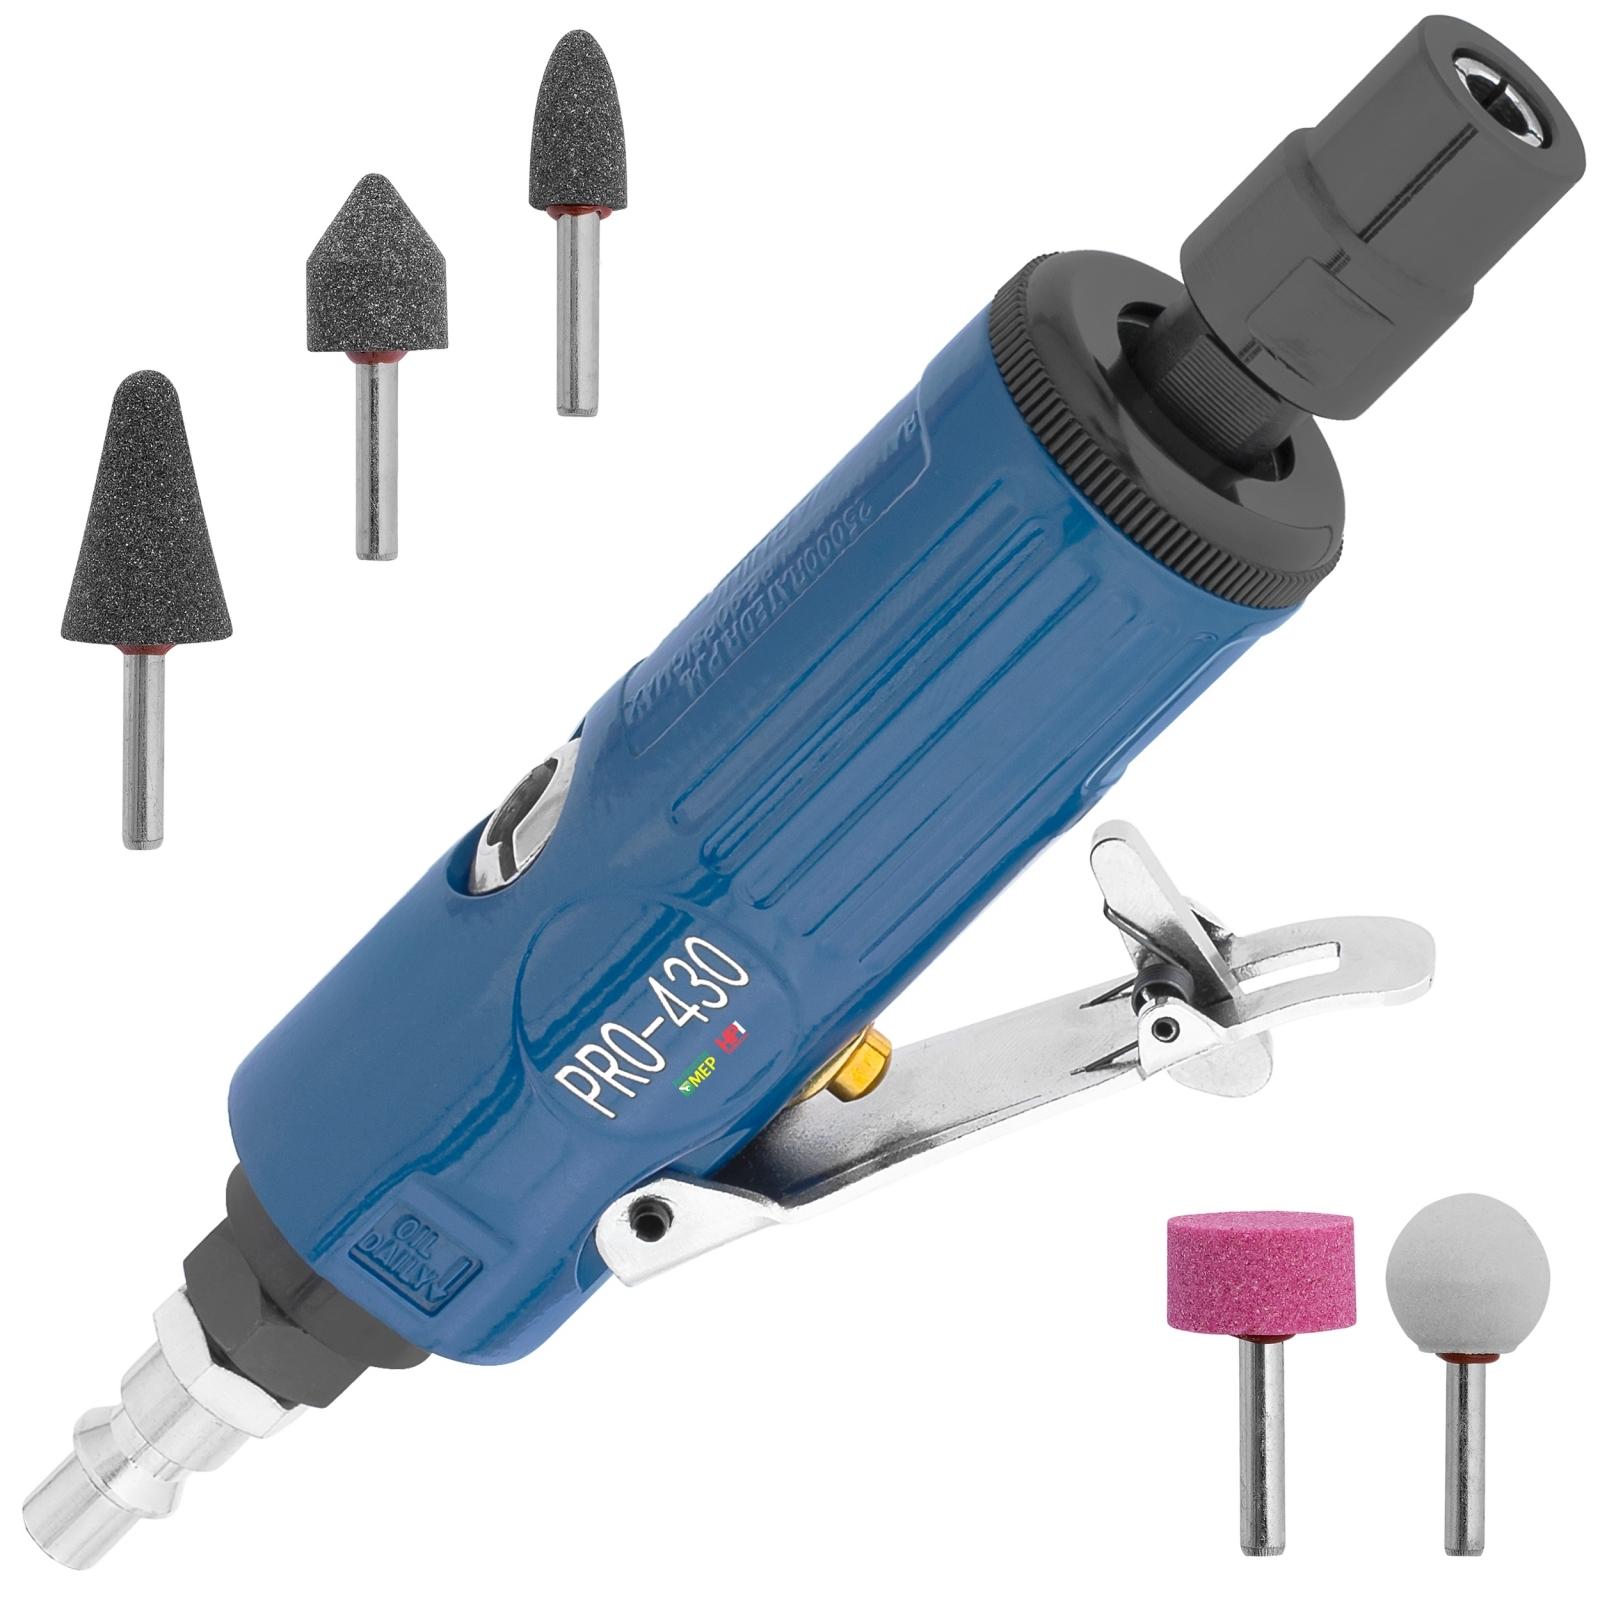 Mini Retífica Pneumática  Ldr Pro PRO430 - Ferramentas MEP